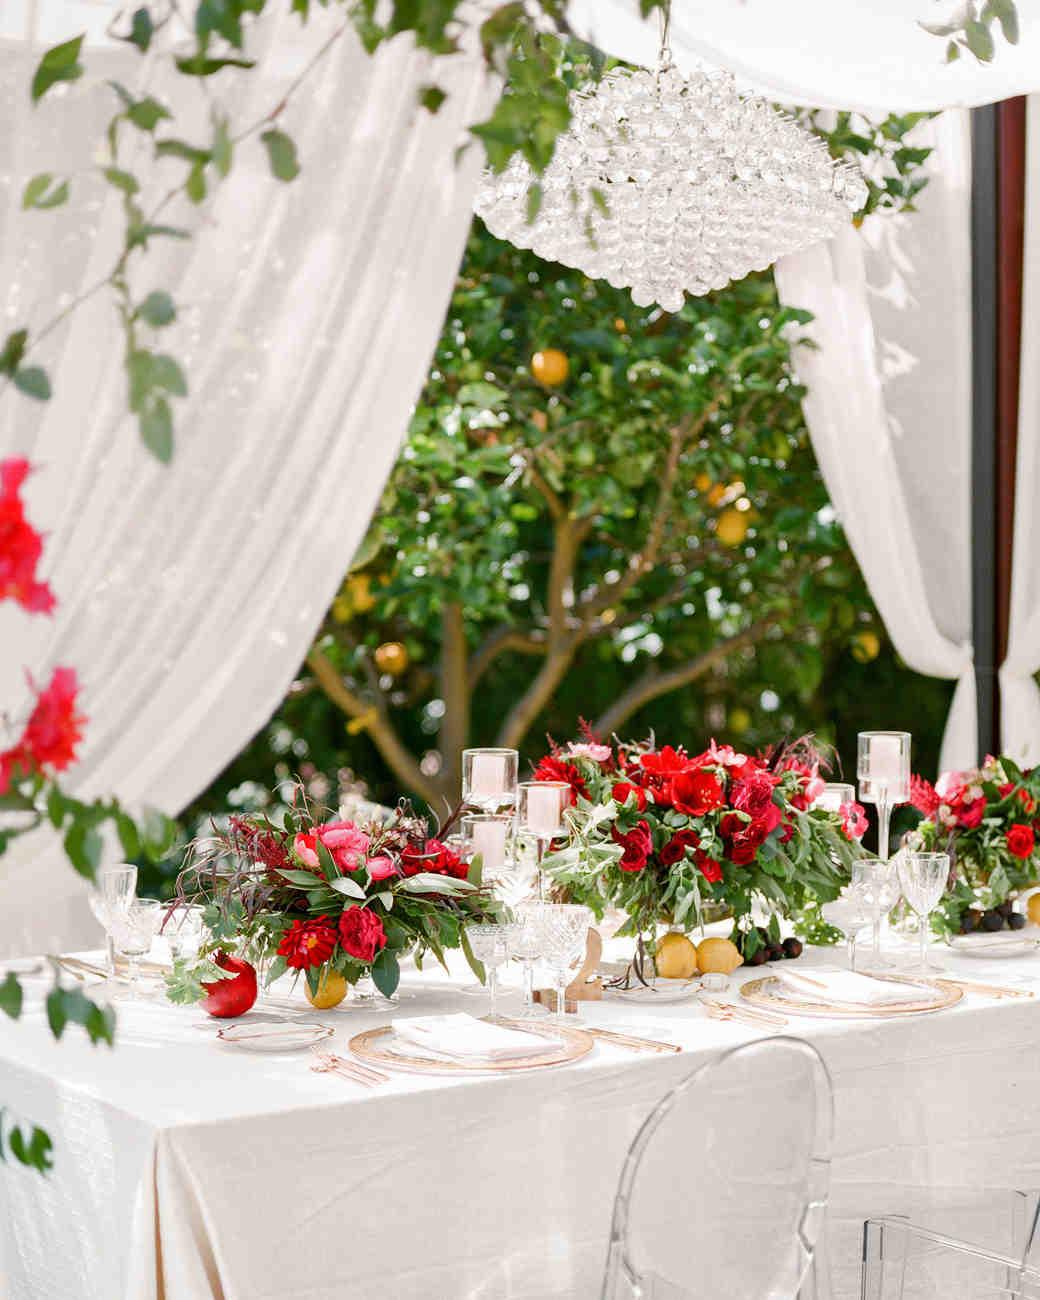 Flowers Wedding Reception Tables